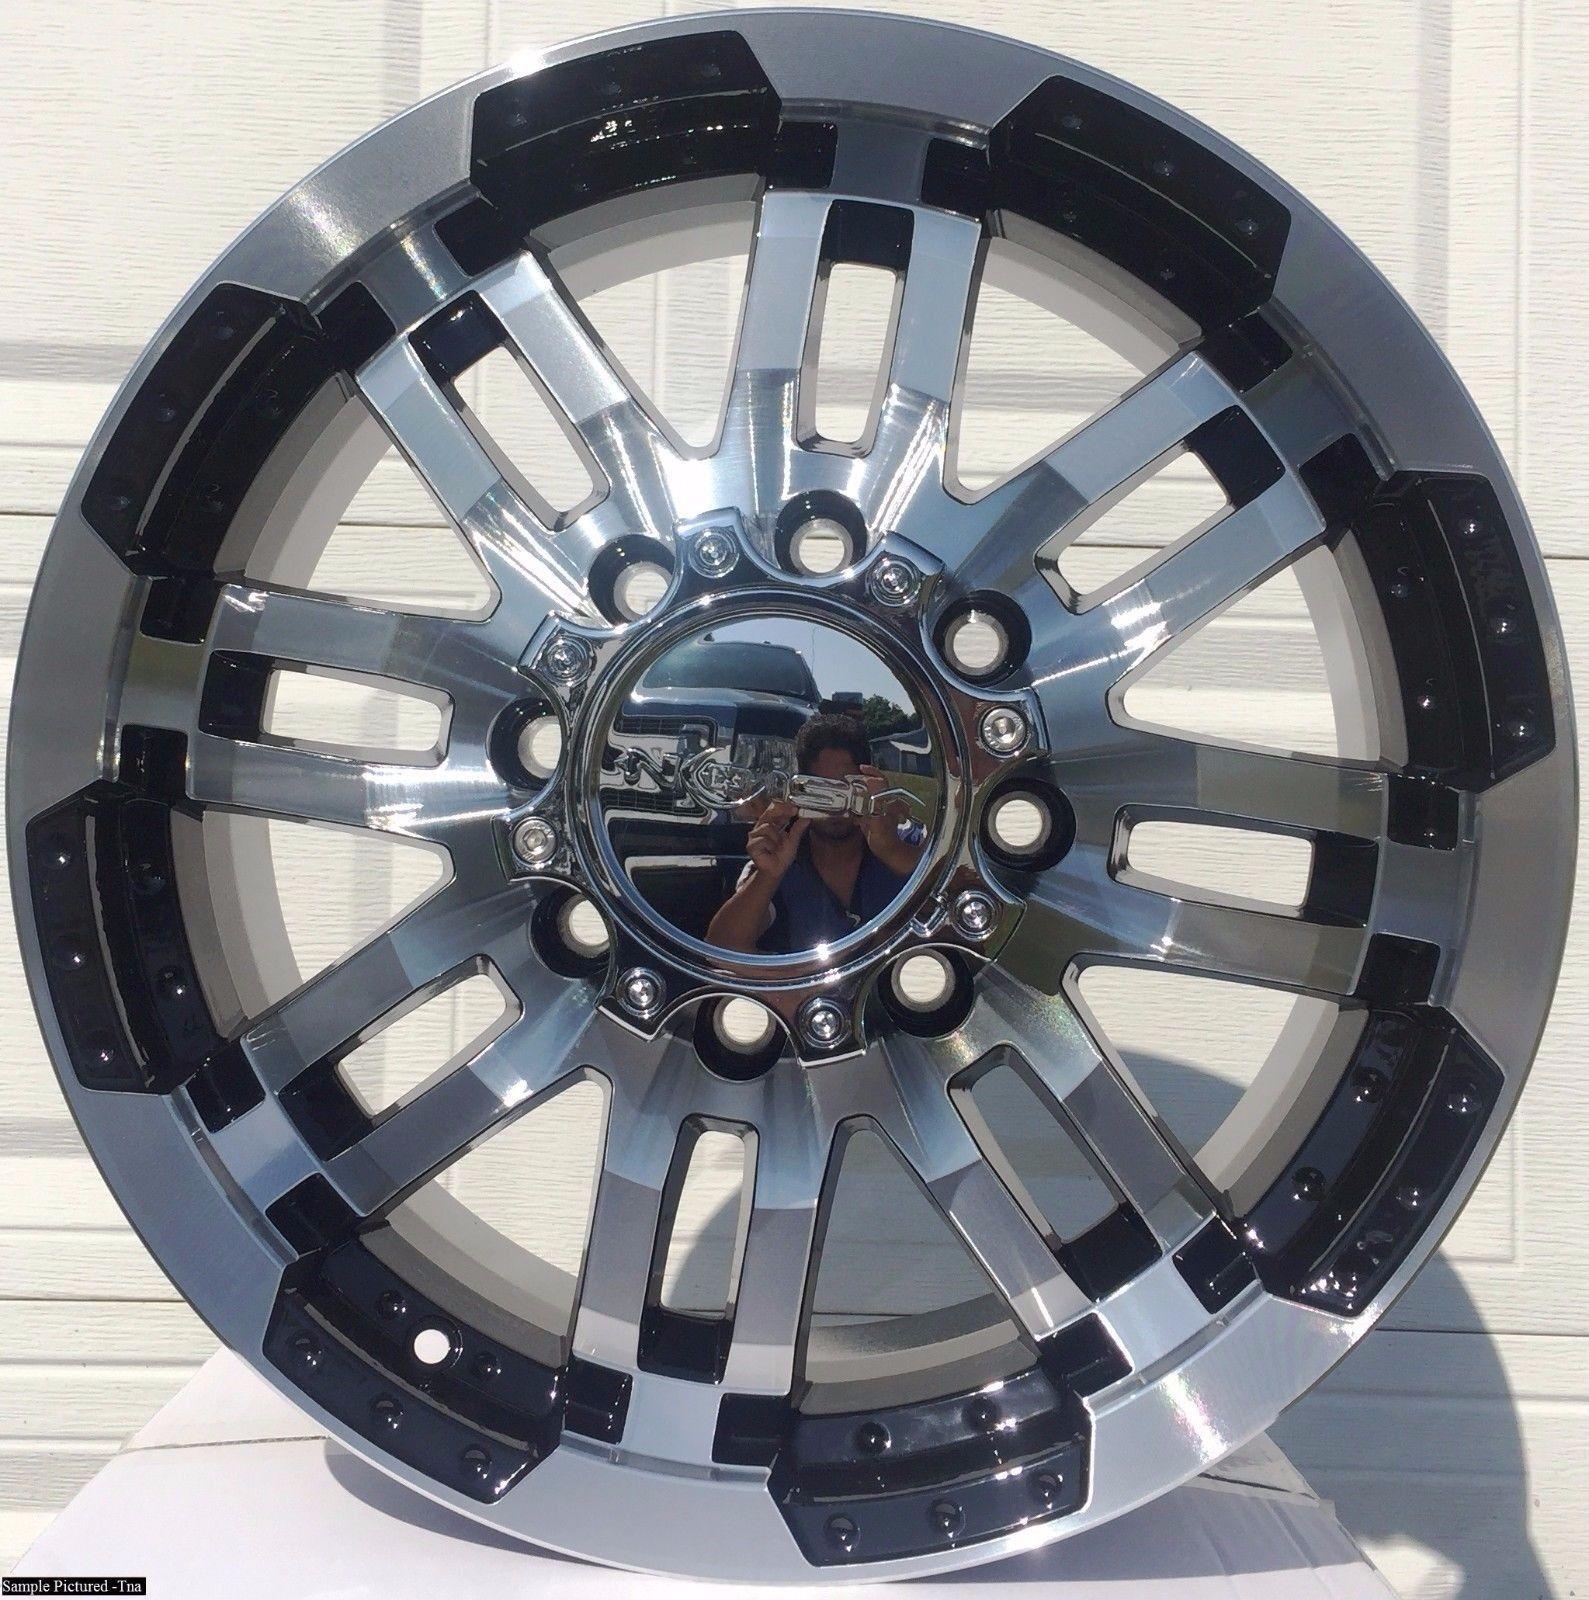 "4 20"" Wheels Rims for Hummer H2 Ford E 150 Nissan NV 1500 2500"